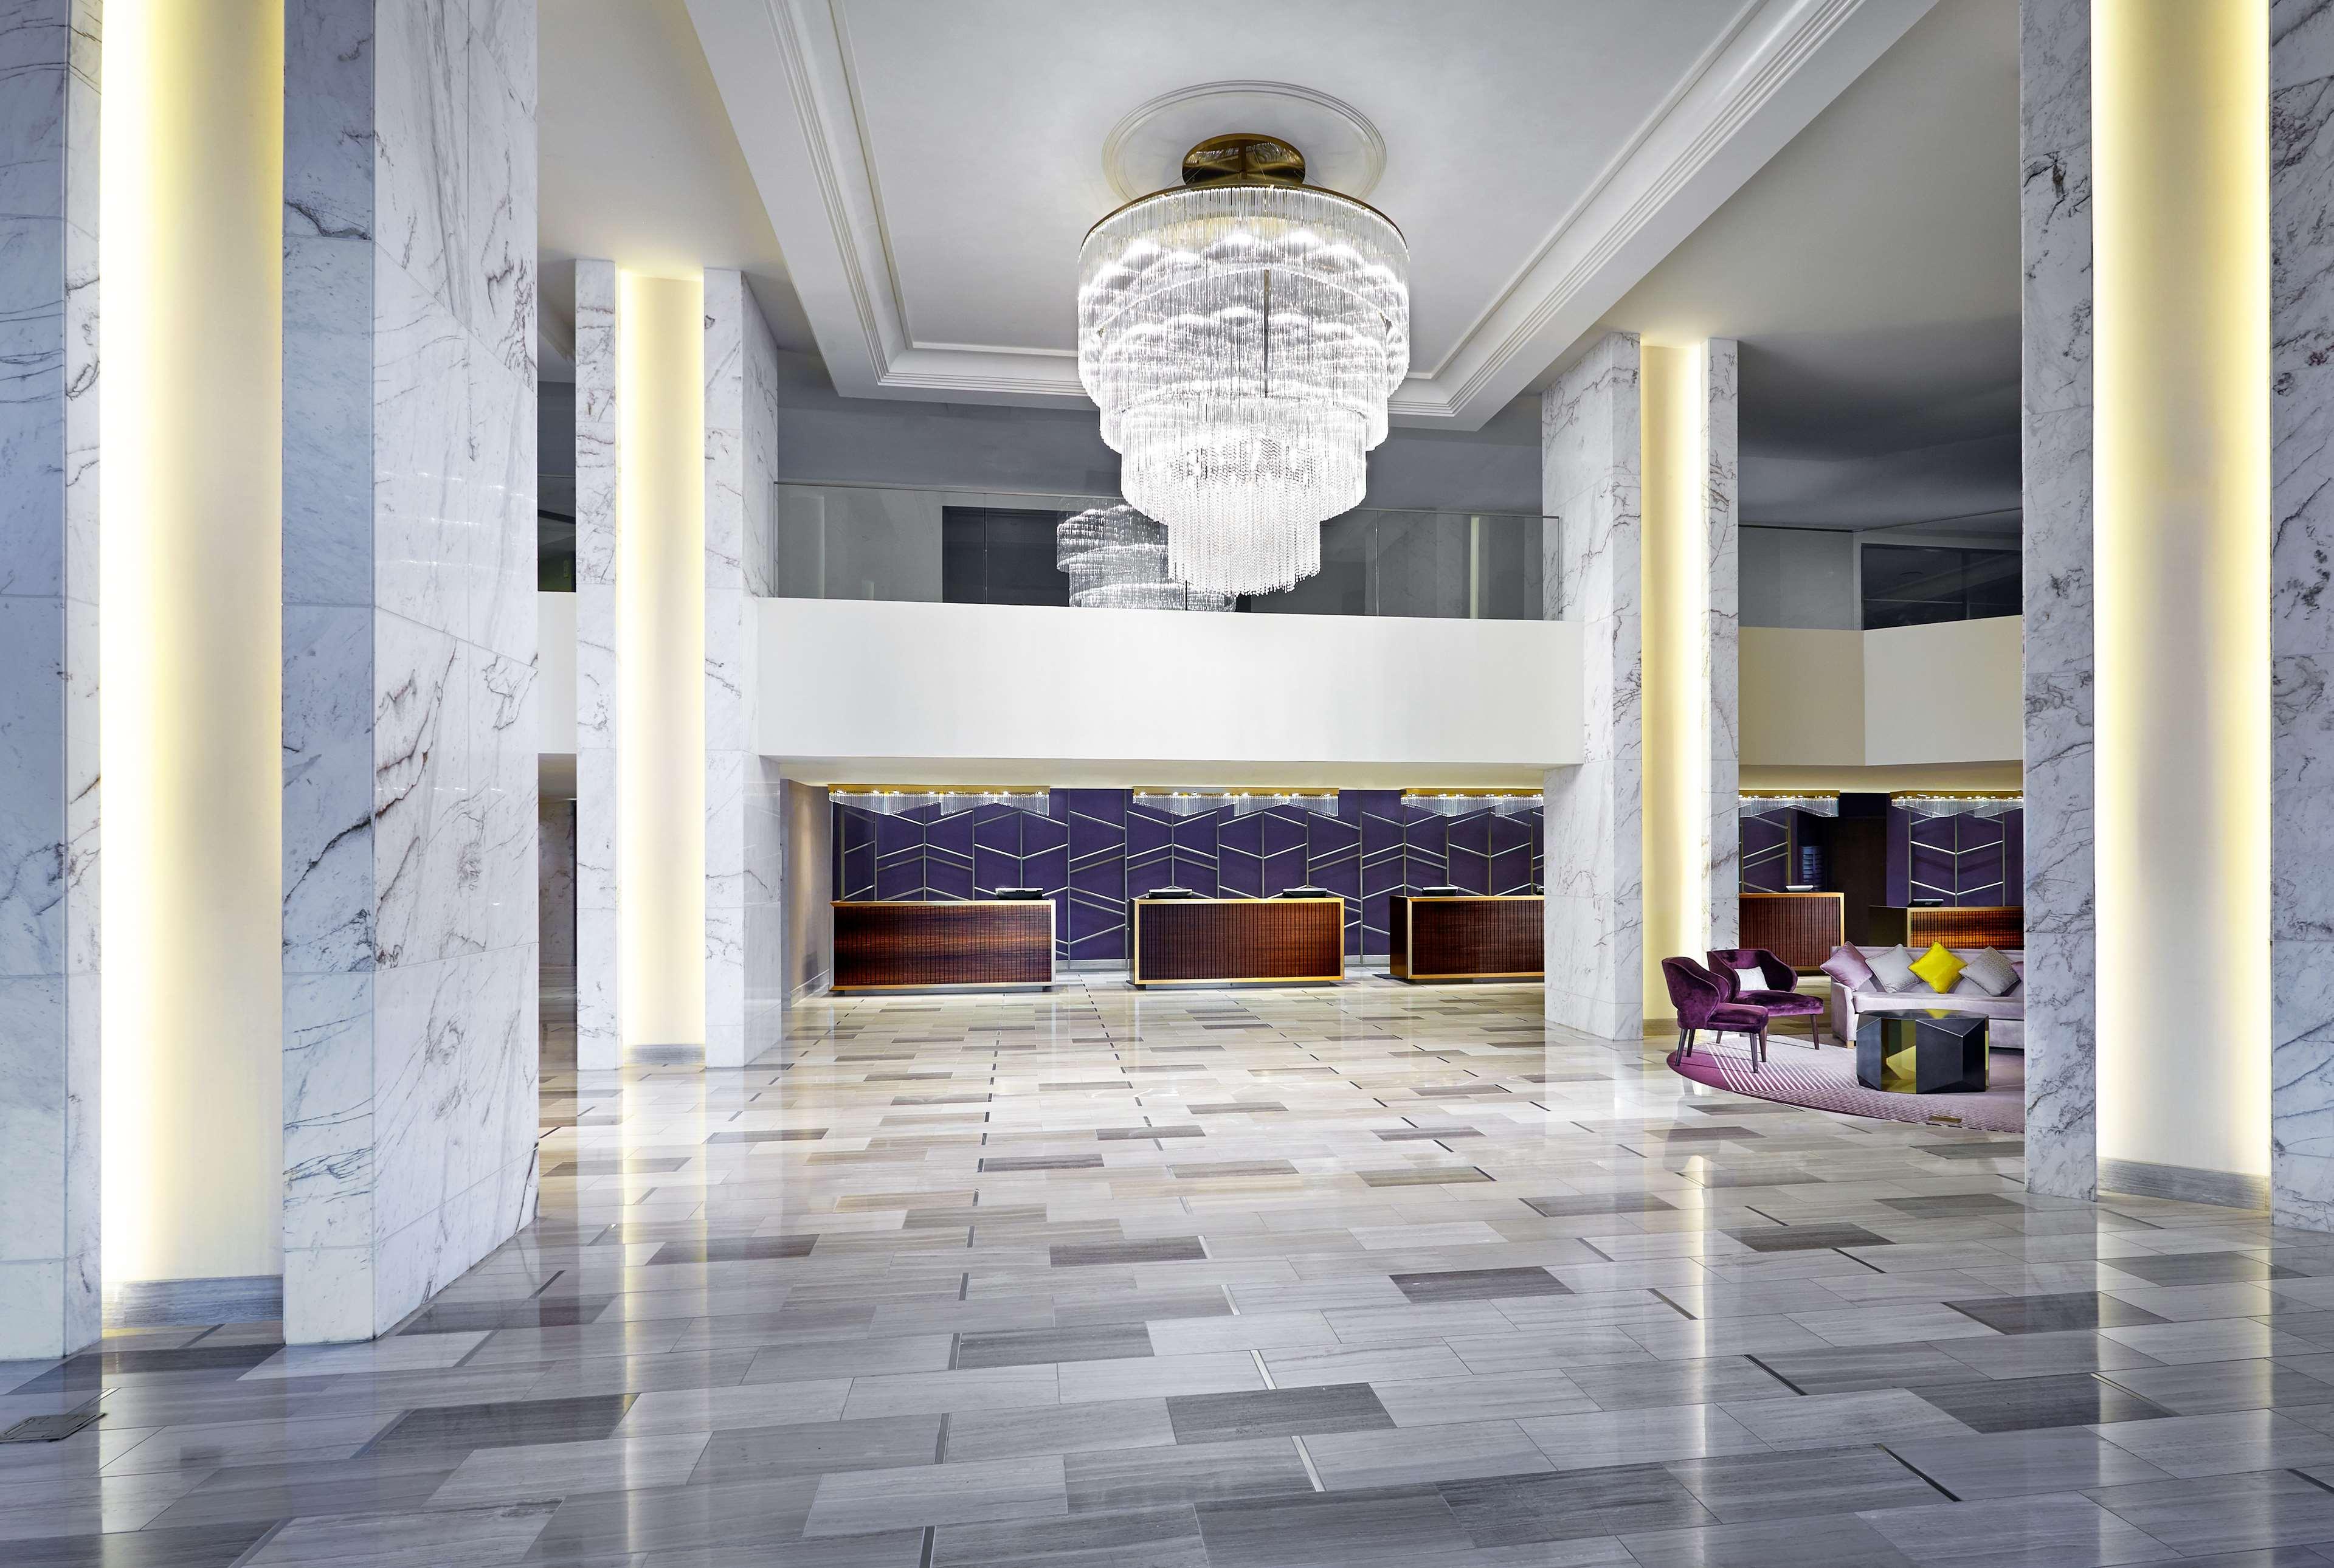 Sheraton Gateway Los Angeles Hotel image 1